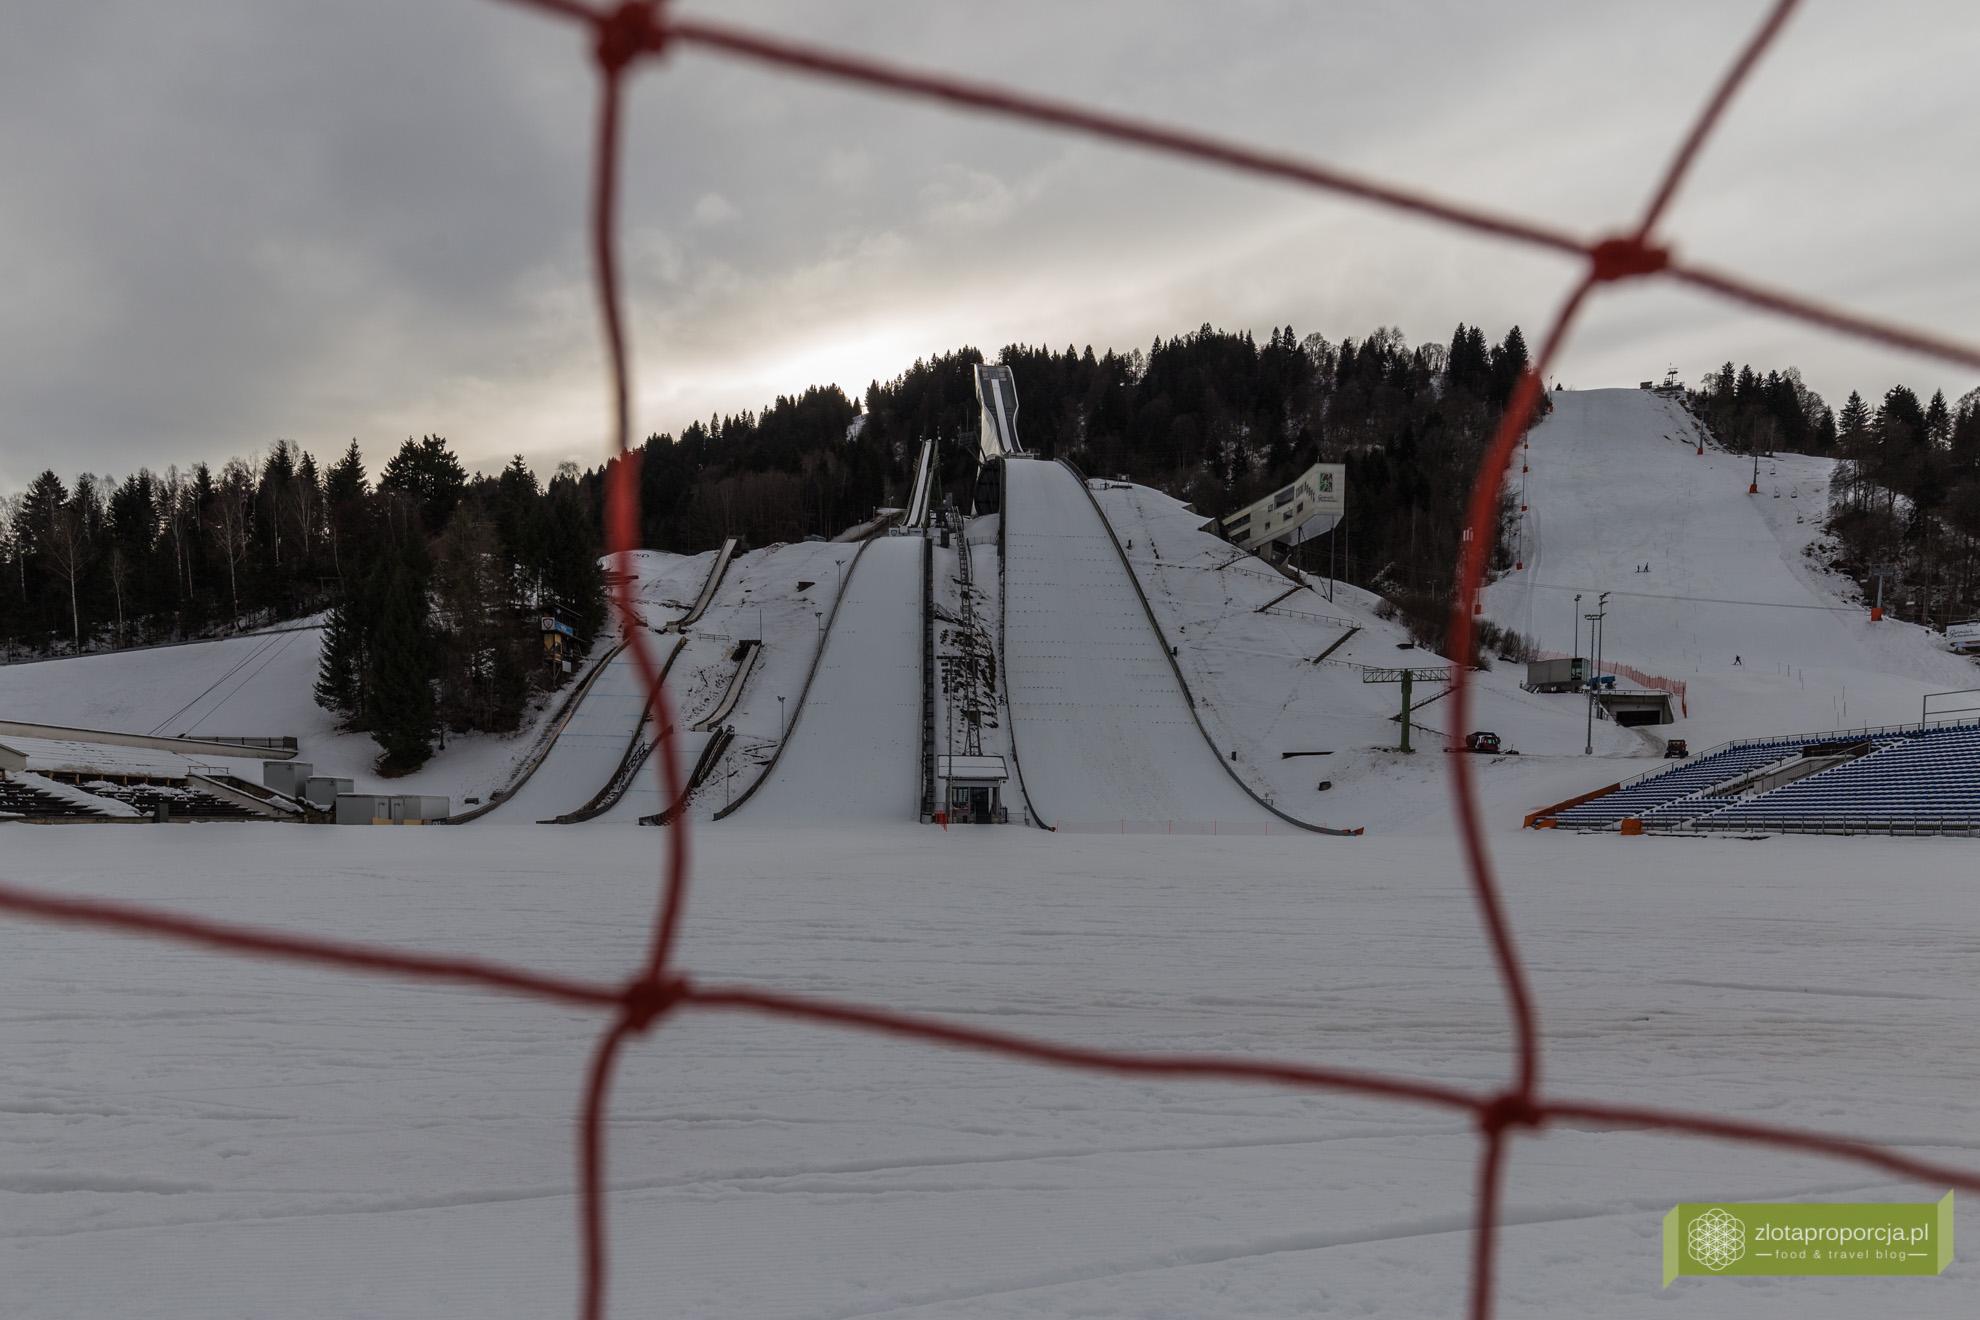 Garmisch-Partenkirchen, Bawaria, skocznia Große Olympiaschanze